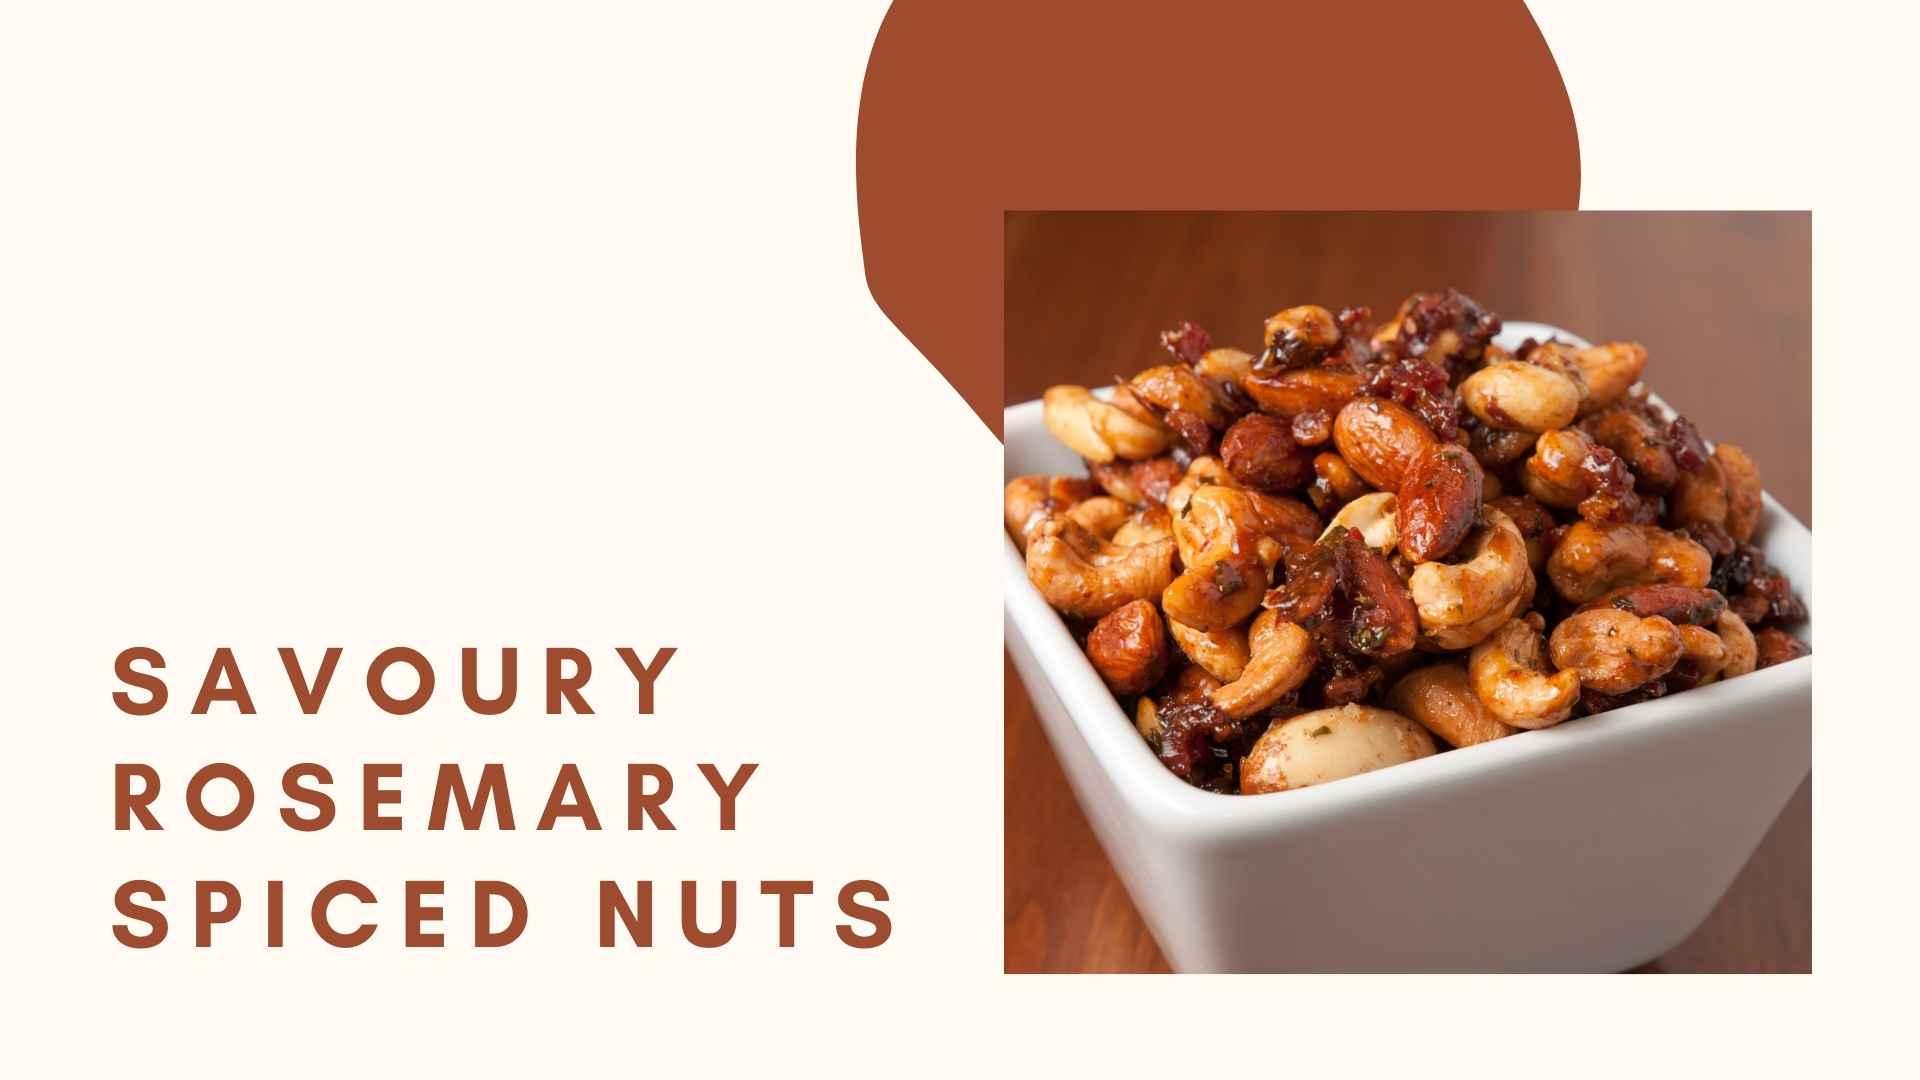 savoury rosemary spiced nuts